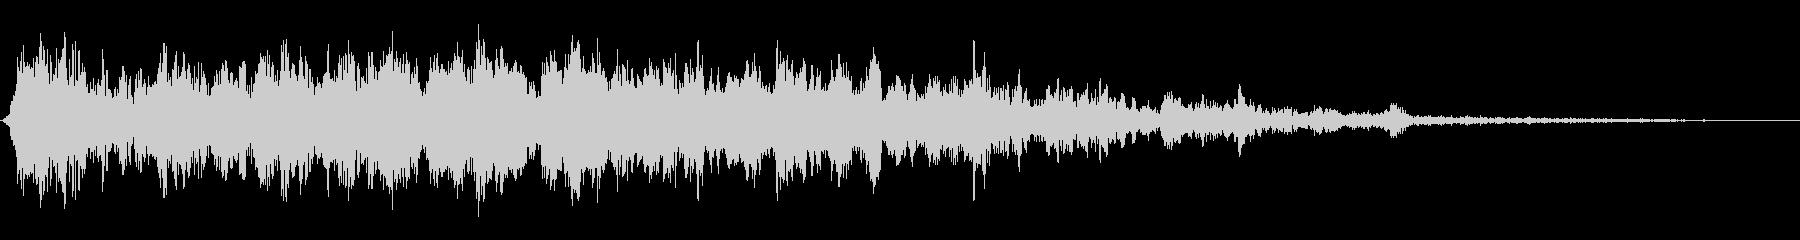 SynthVarious EC03...の未再生の波形